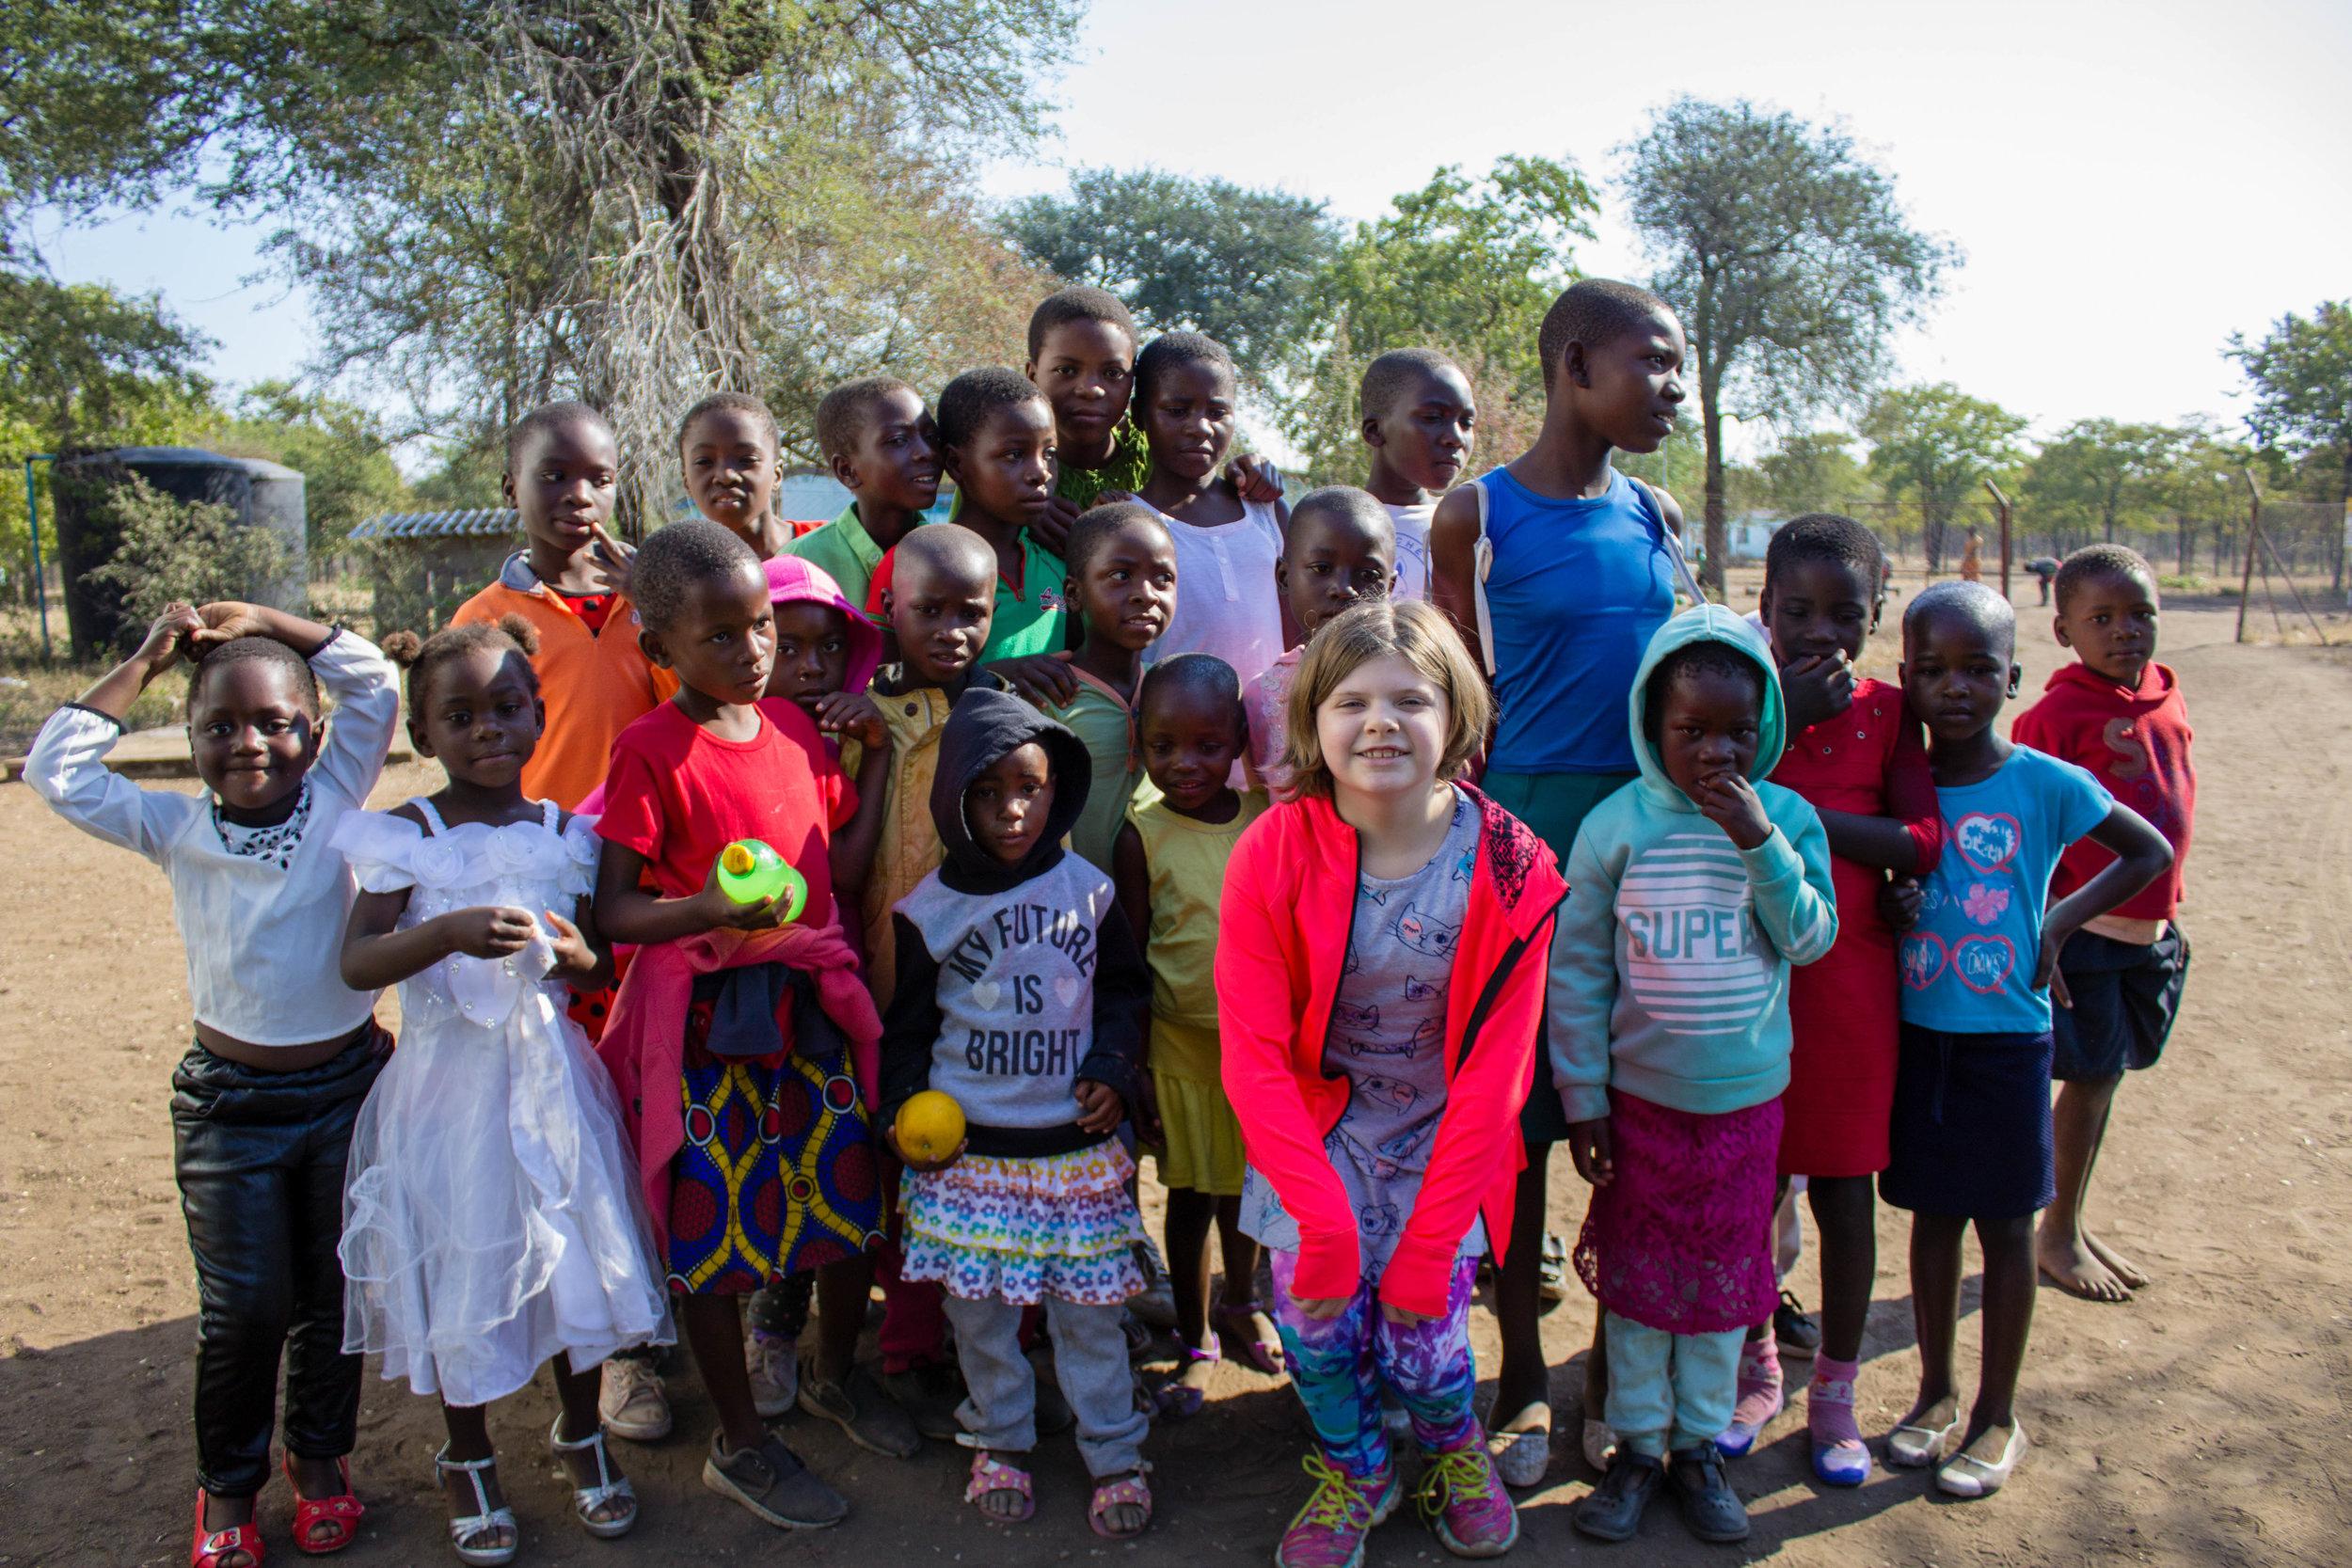 Zimbabwe Dama Children's Group